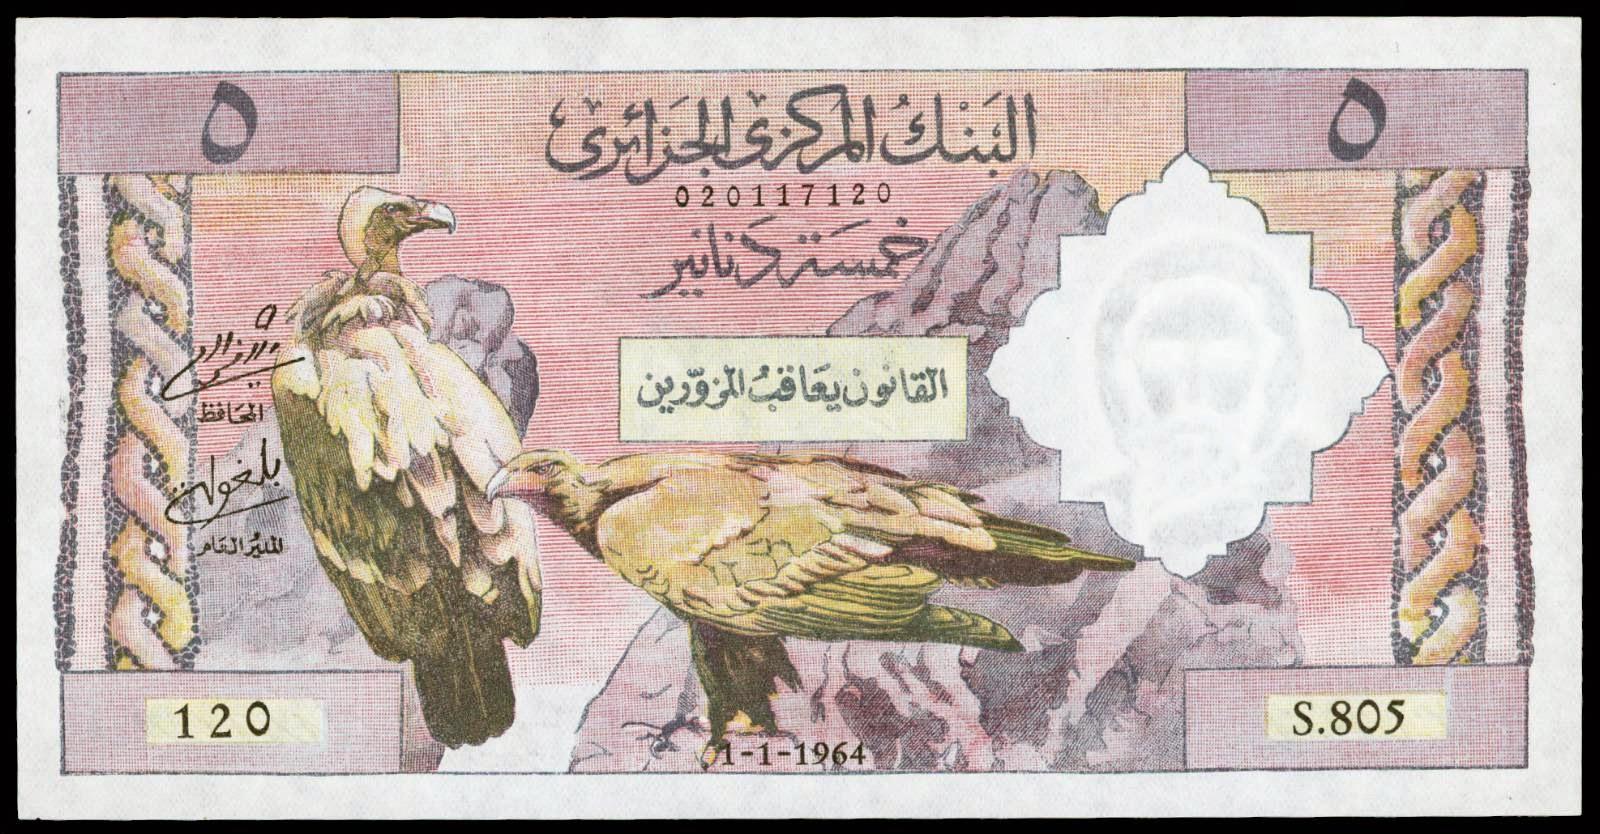 Algeria currency 5 Dinars banknote 1964